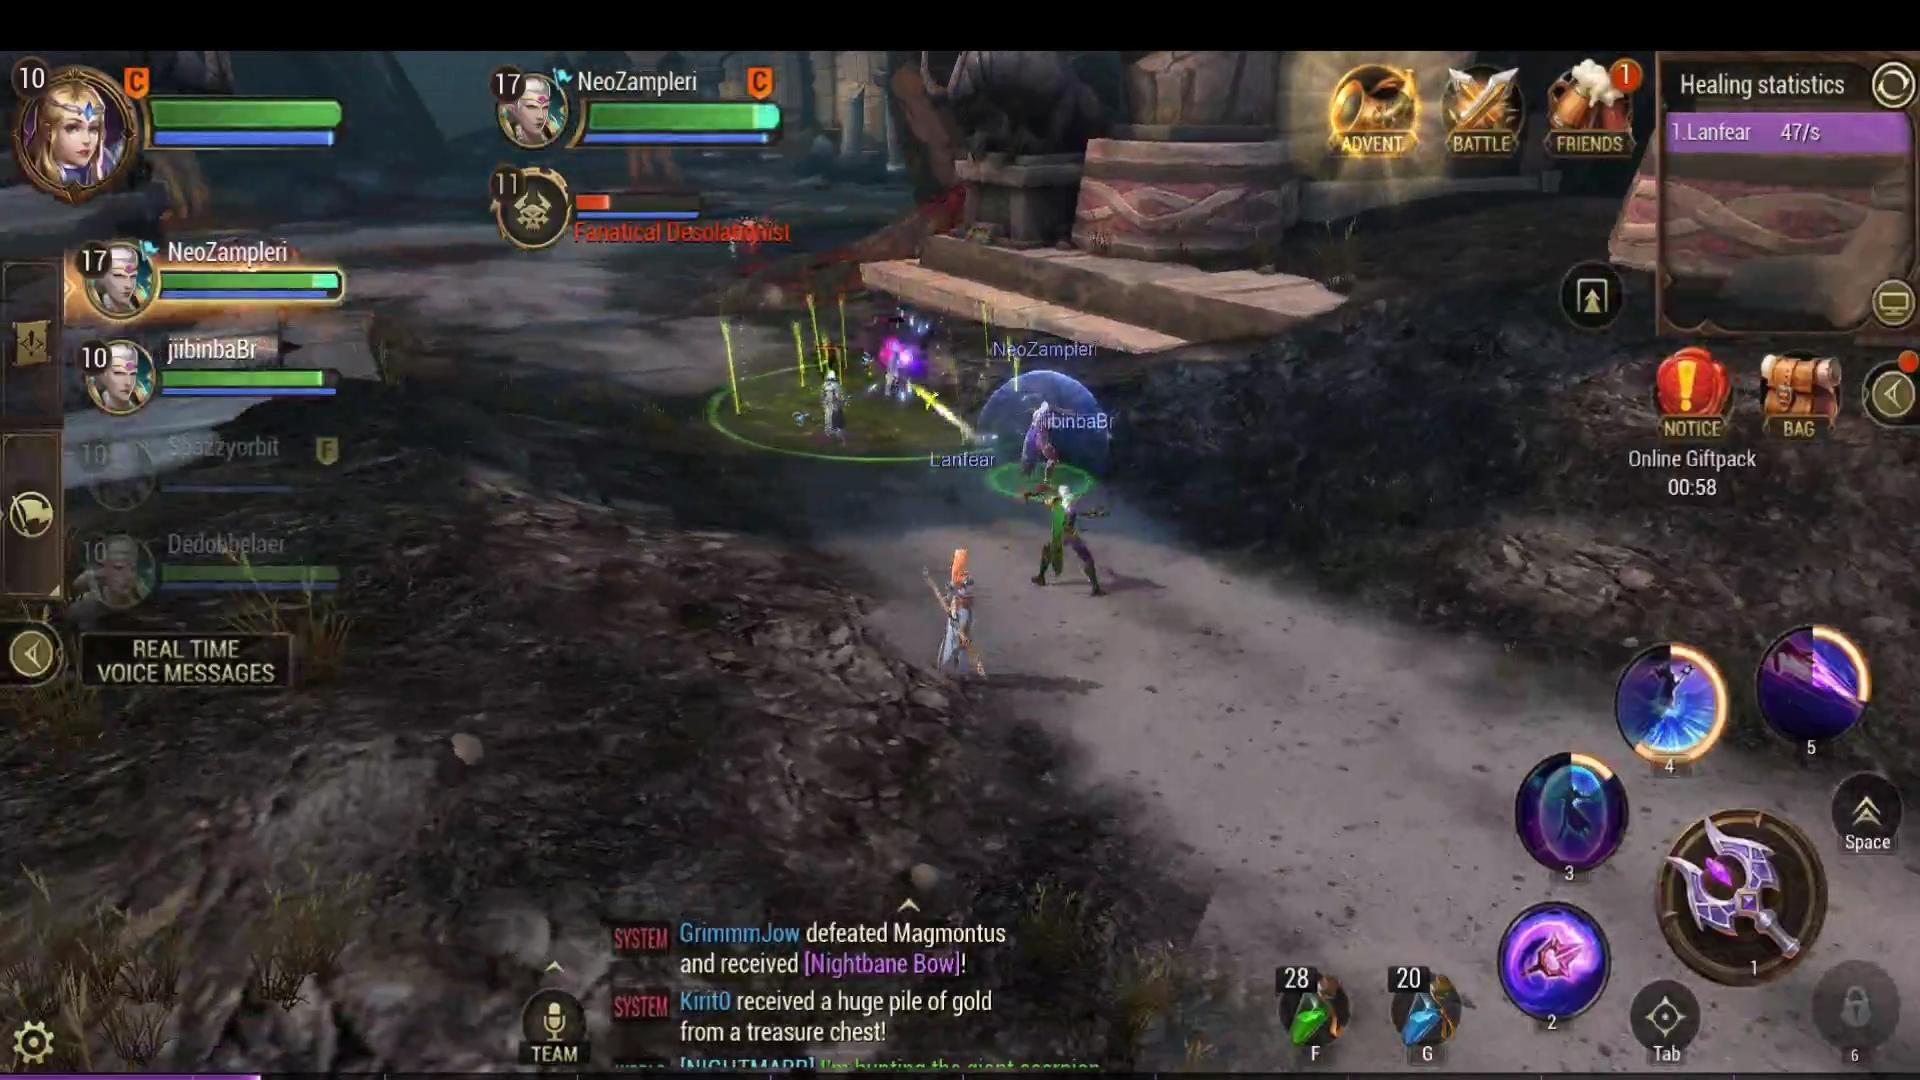 Crusaders of Light - Review